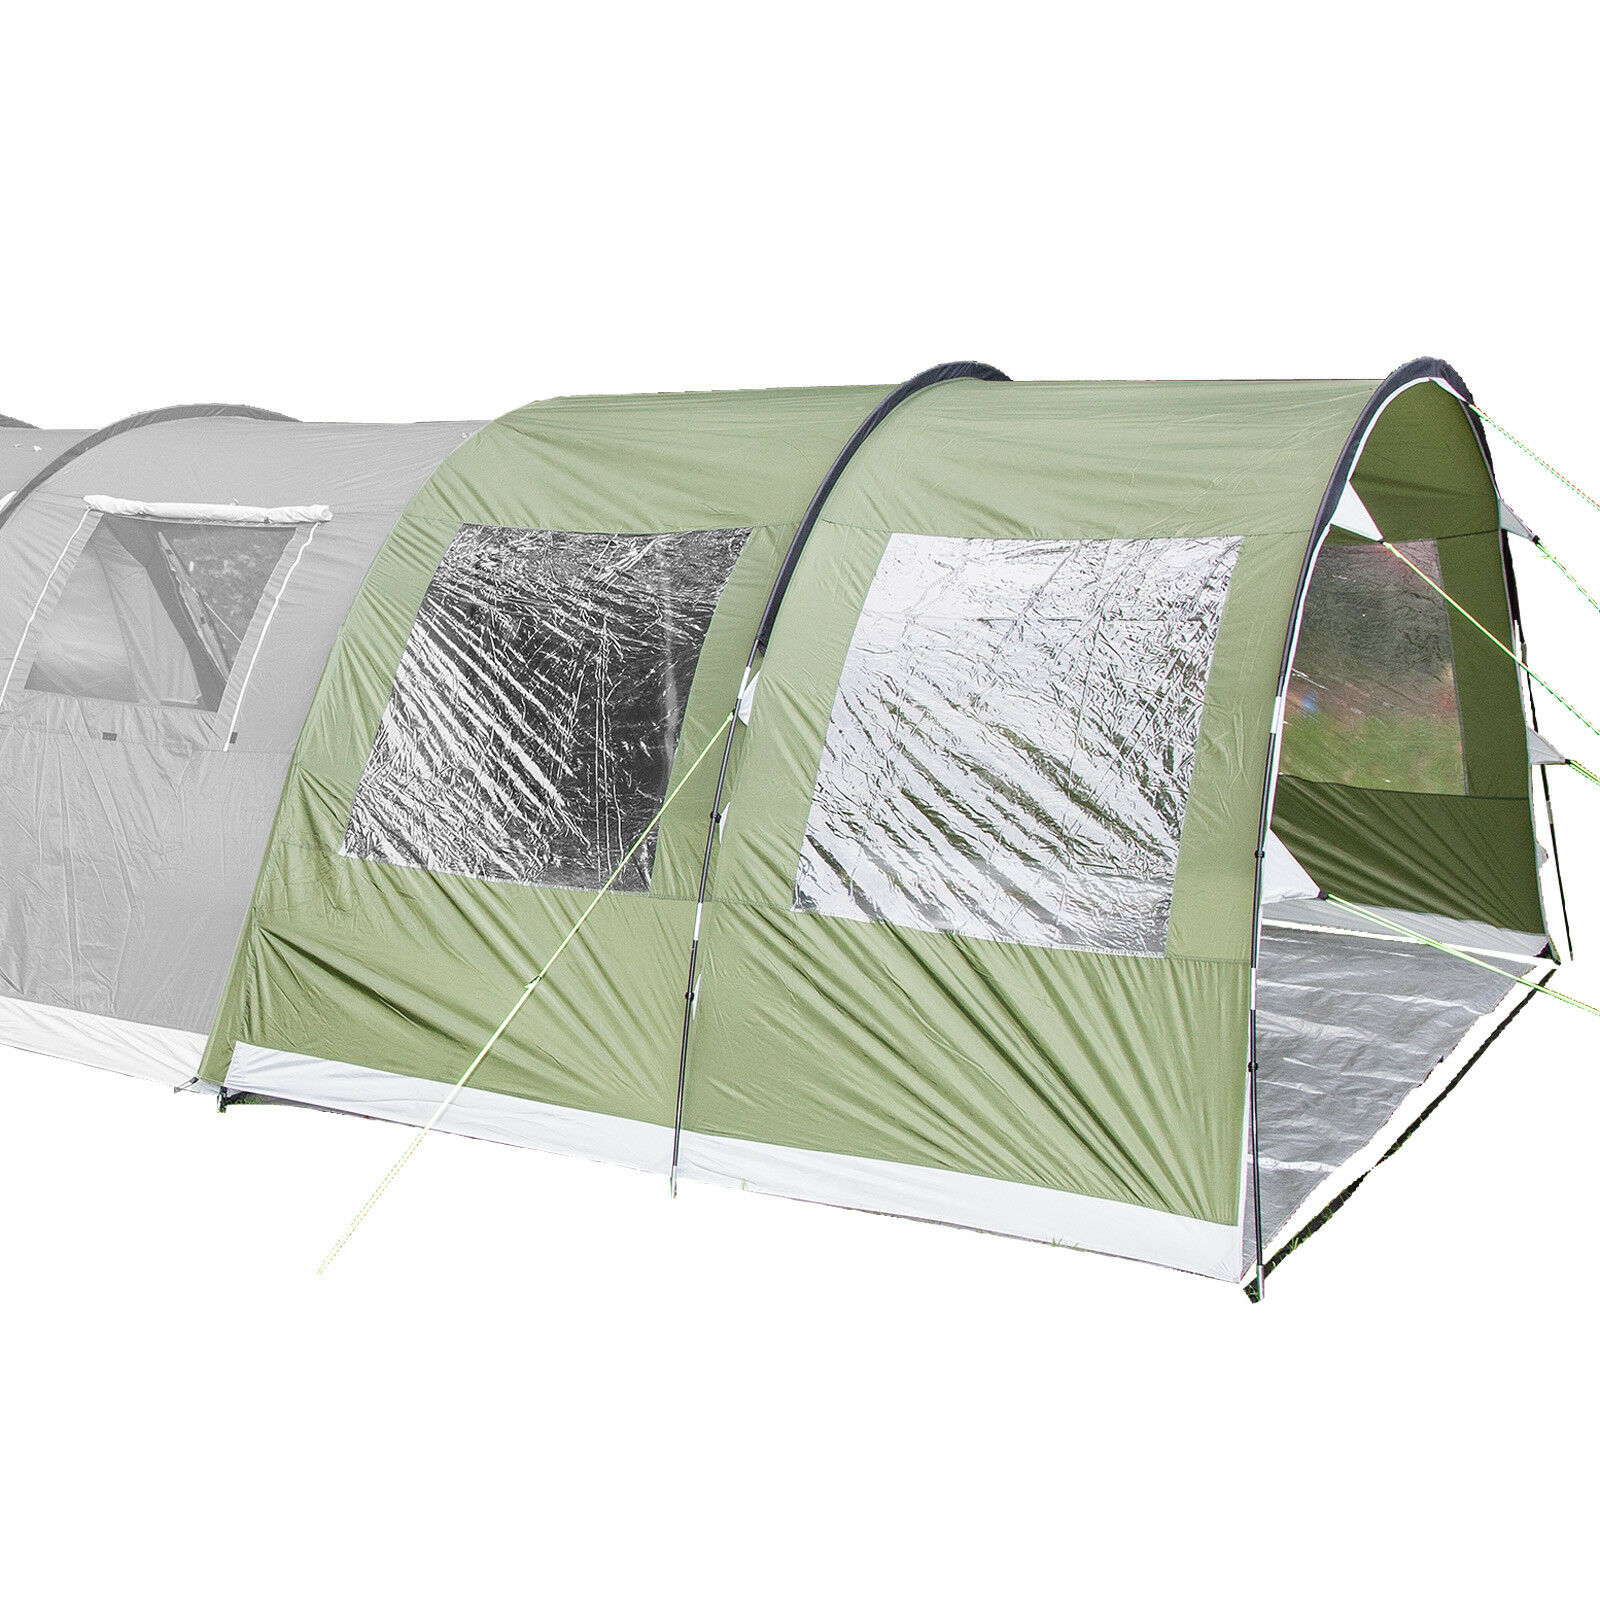 Skandika GOTLAND Canopy 5 Awning Weather Prougeection 370x240x210 cm vert nouveau